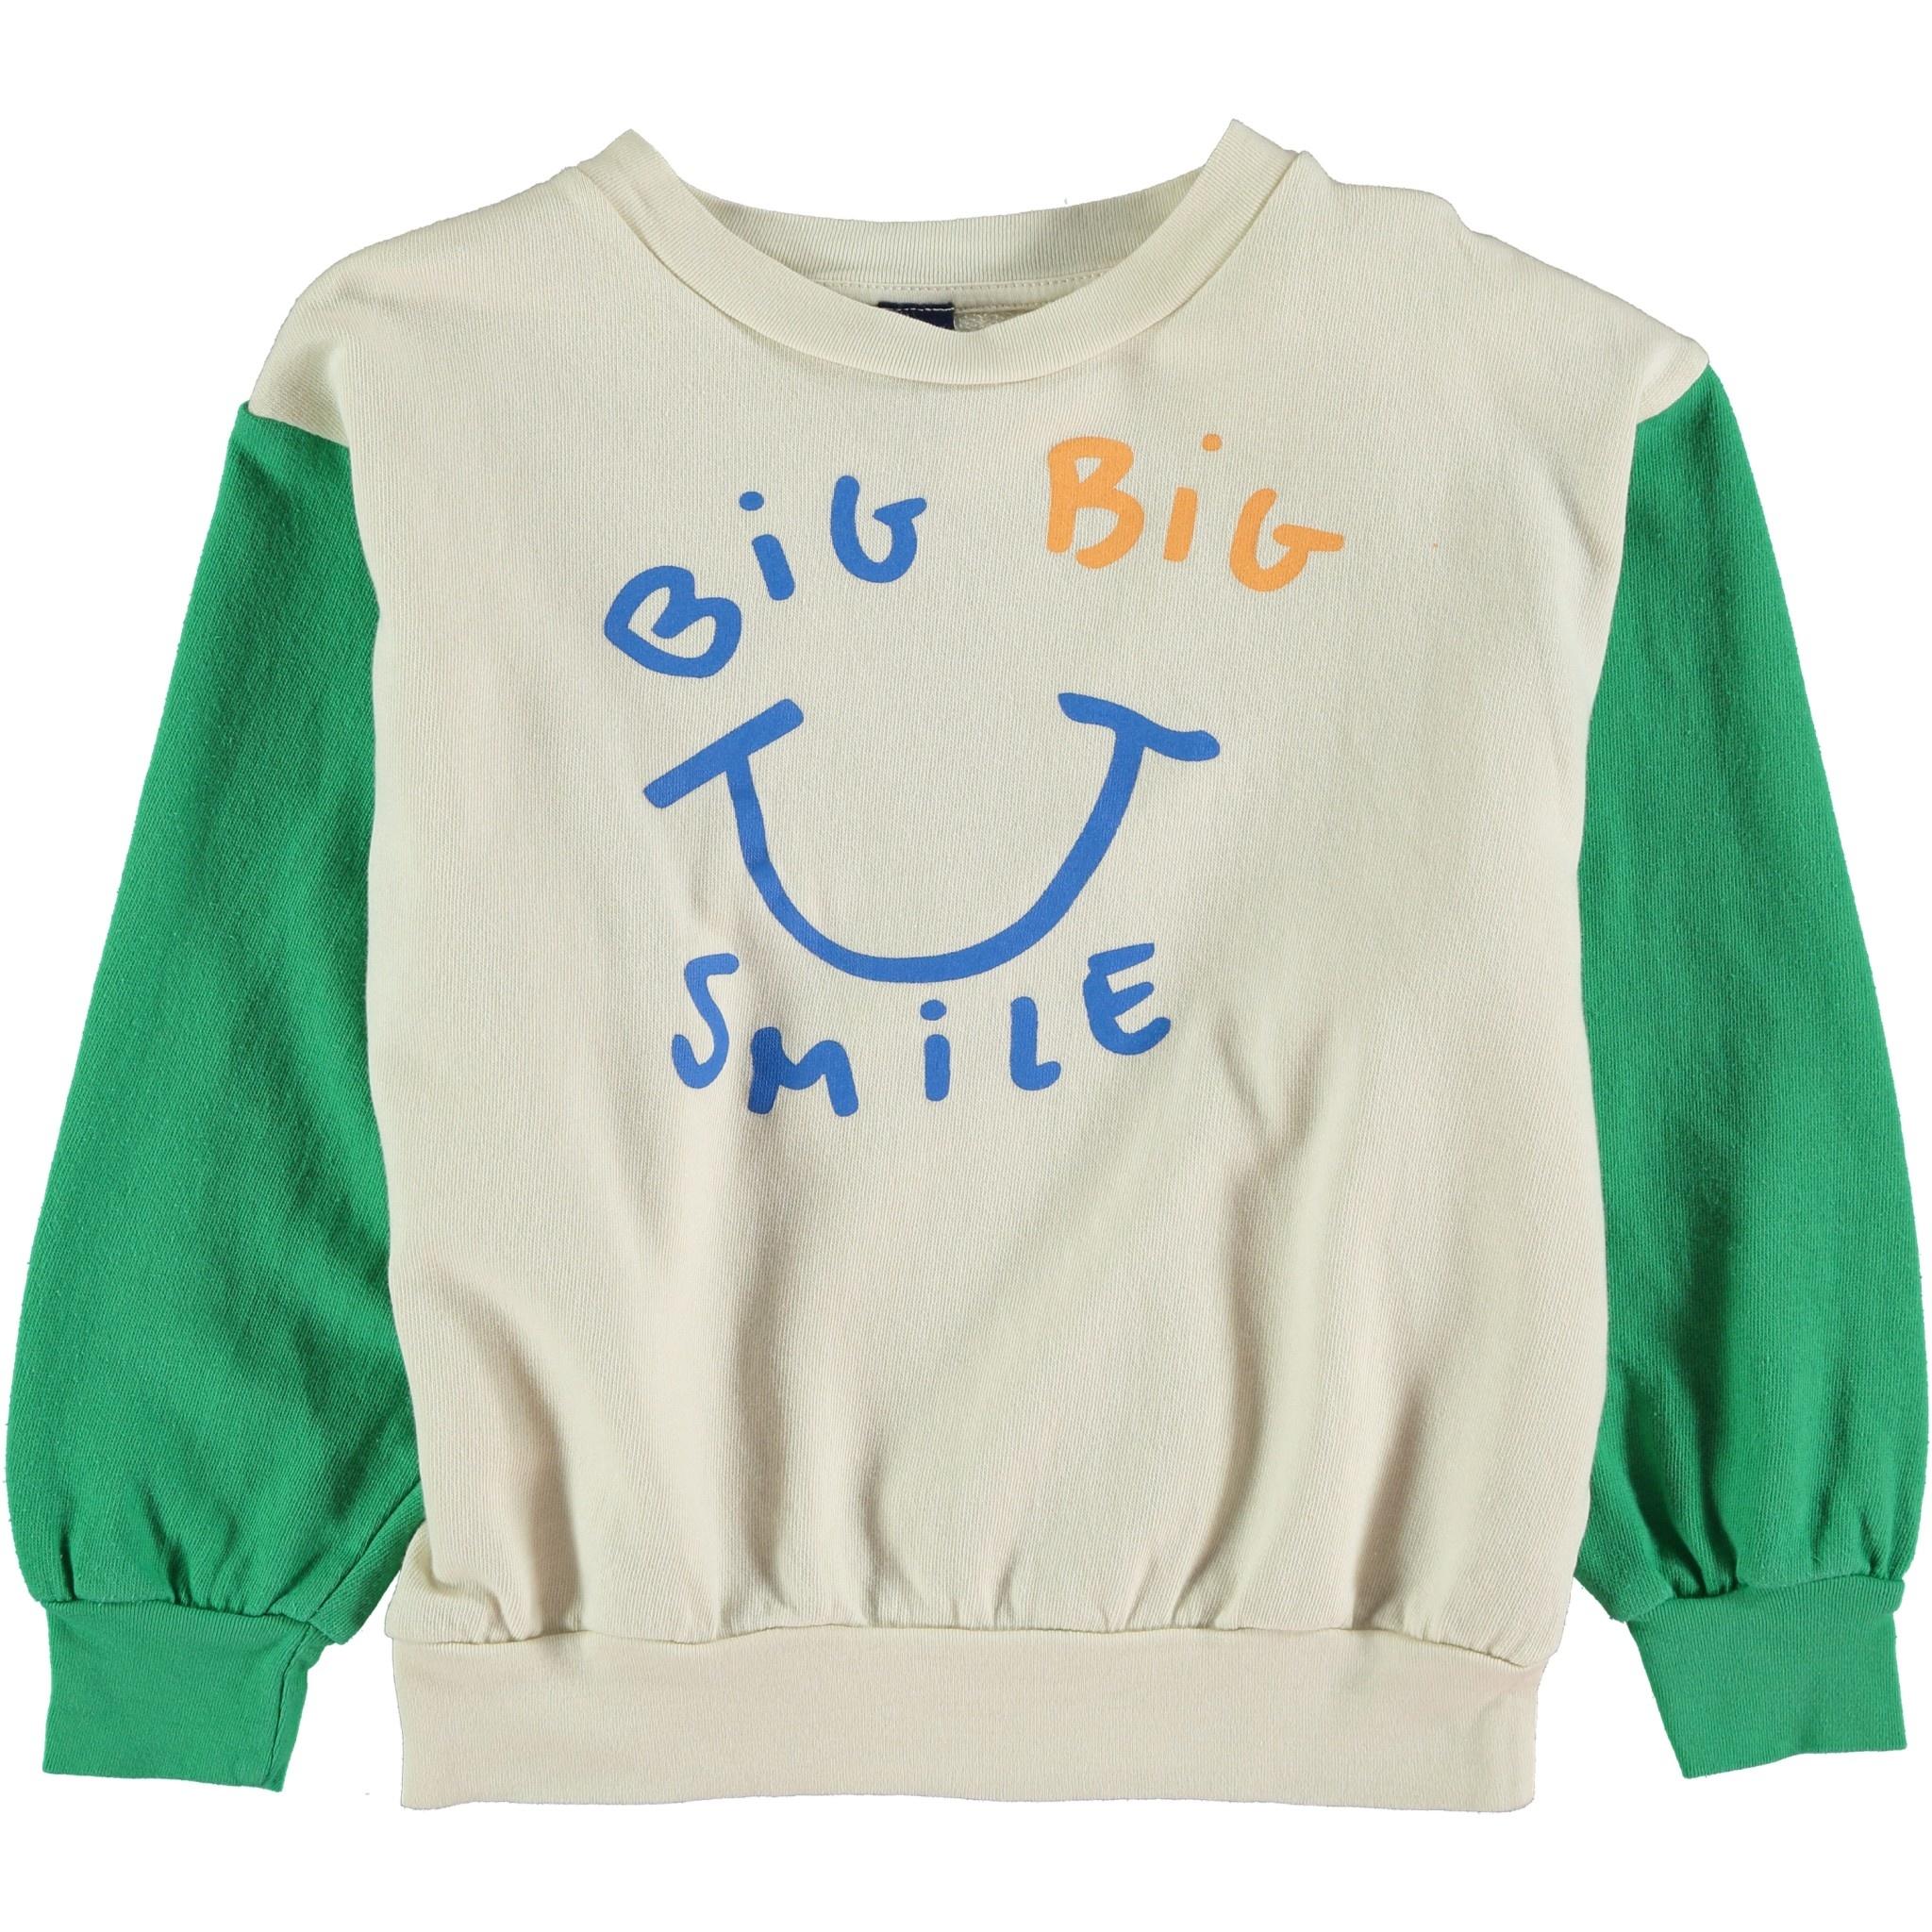 Sweatshirt big smile green kids-1